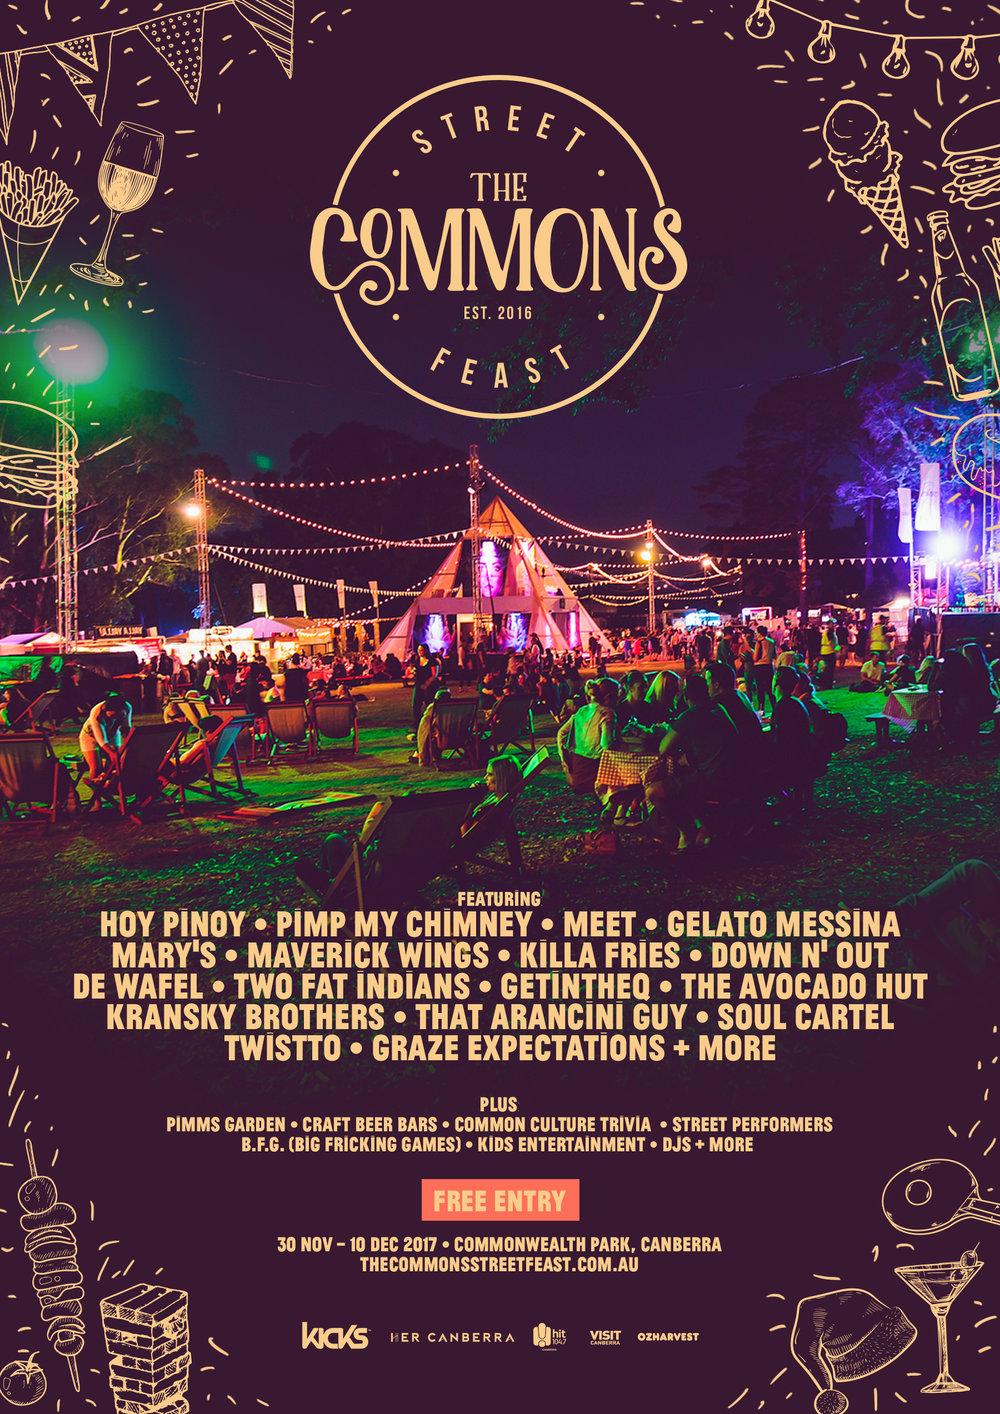 The Commons Street Feast 2017 Announcement.jpg